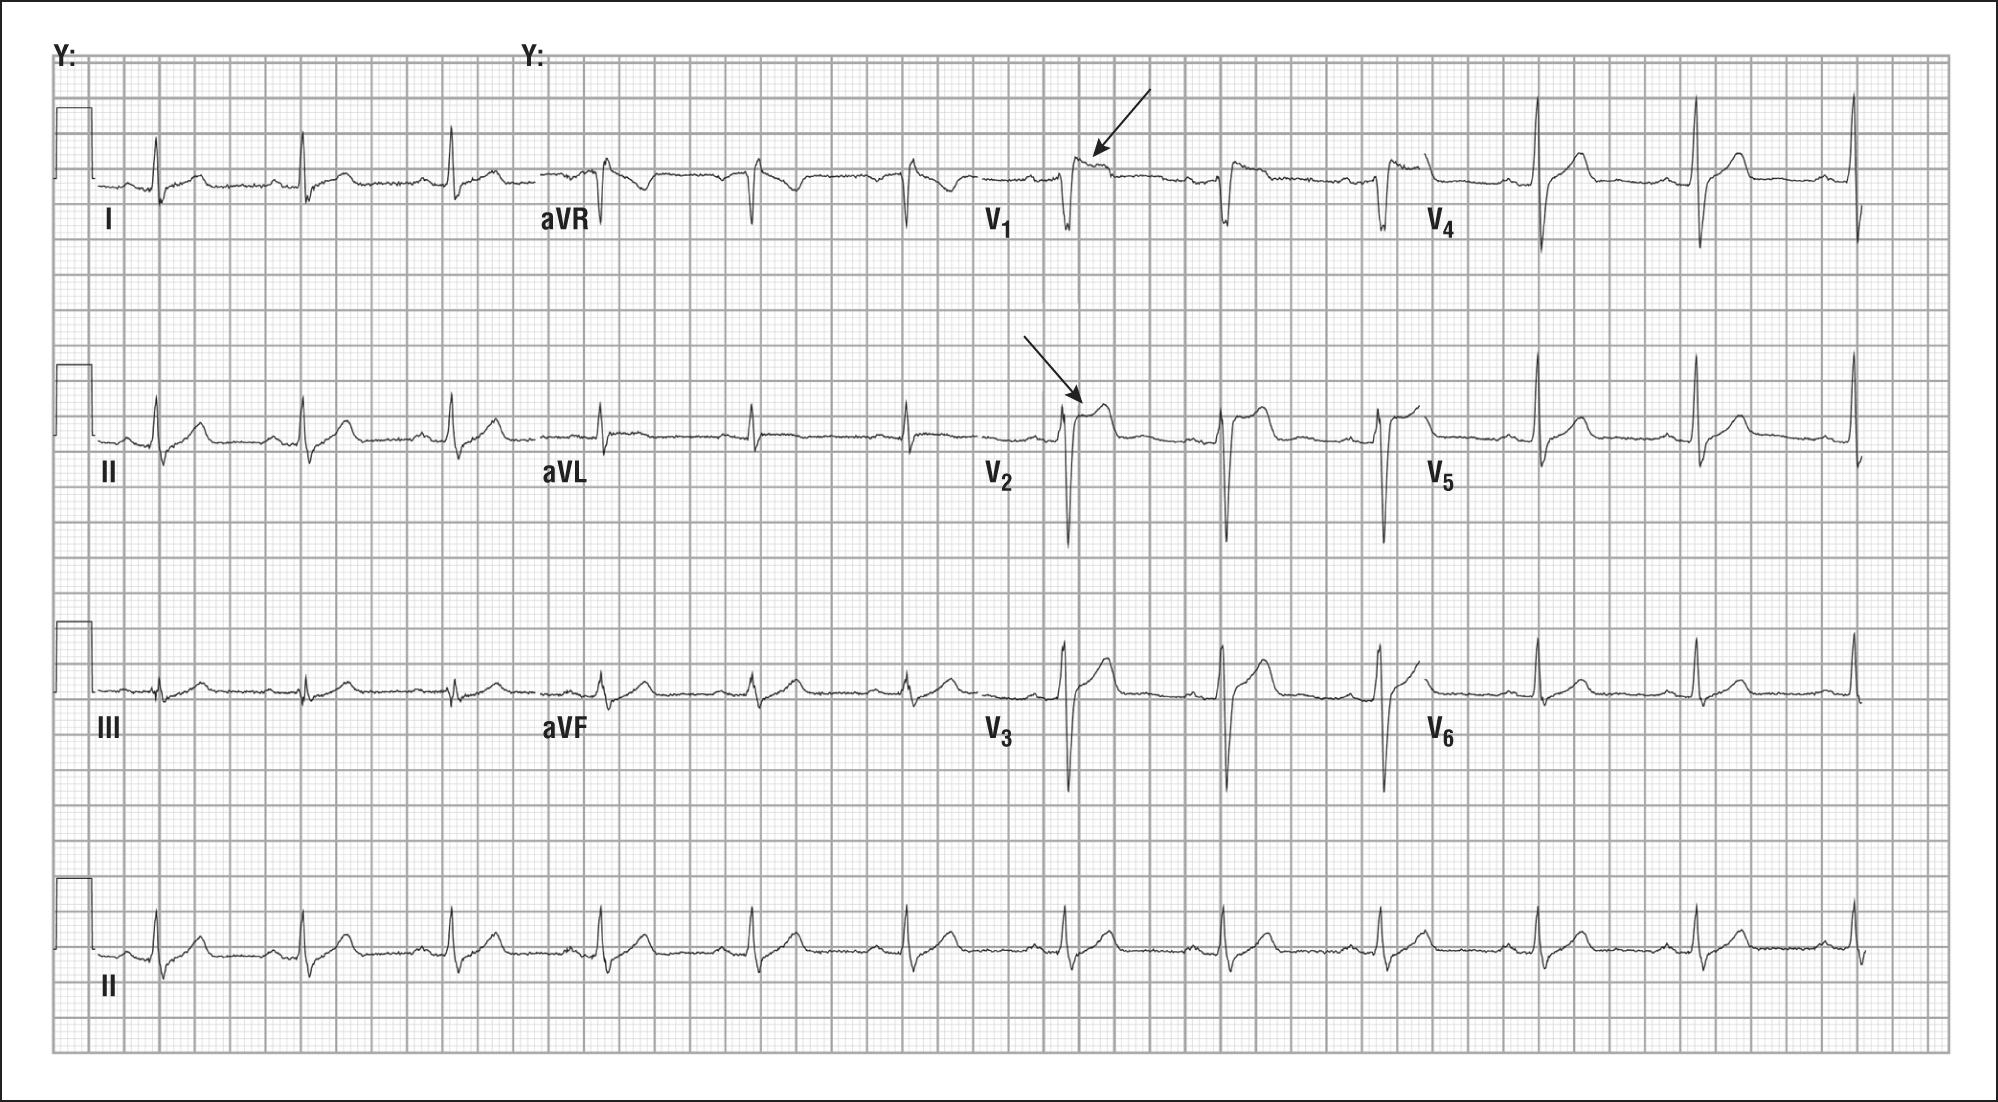 Life-Threatening ST-Segment Elevation Without Coronary